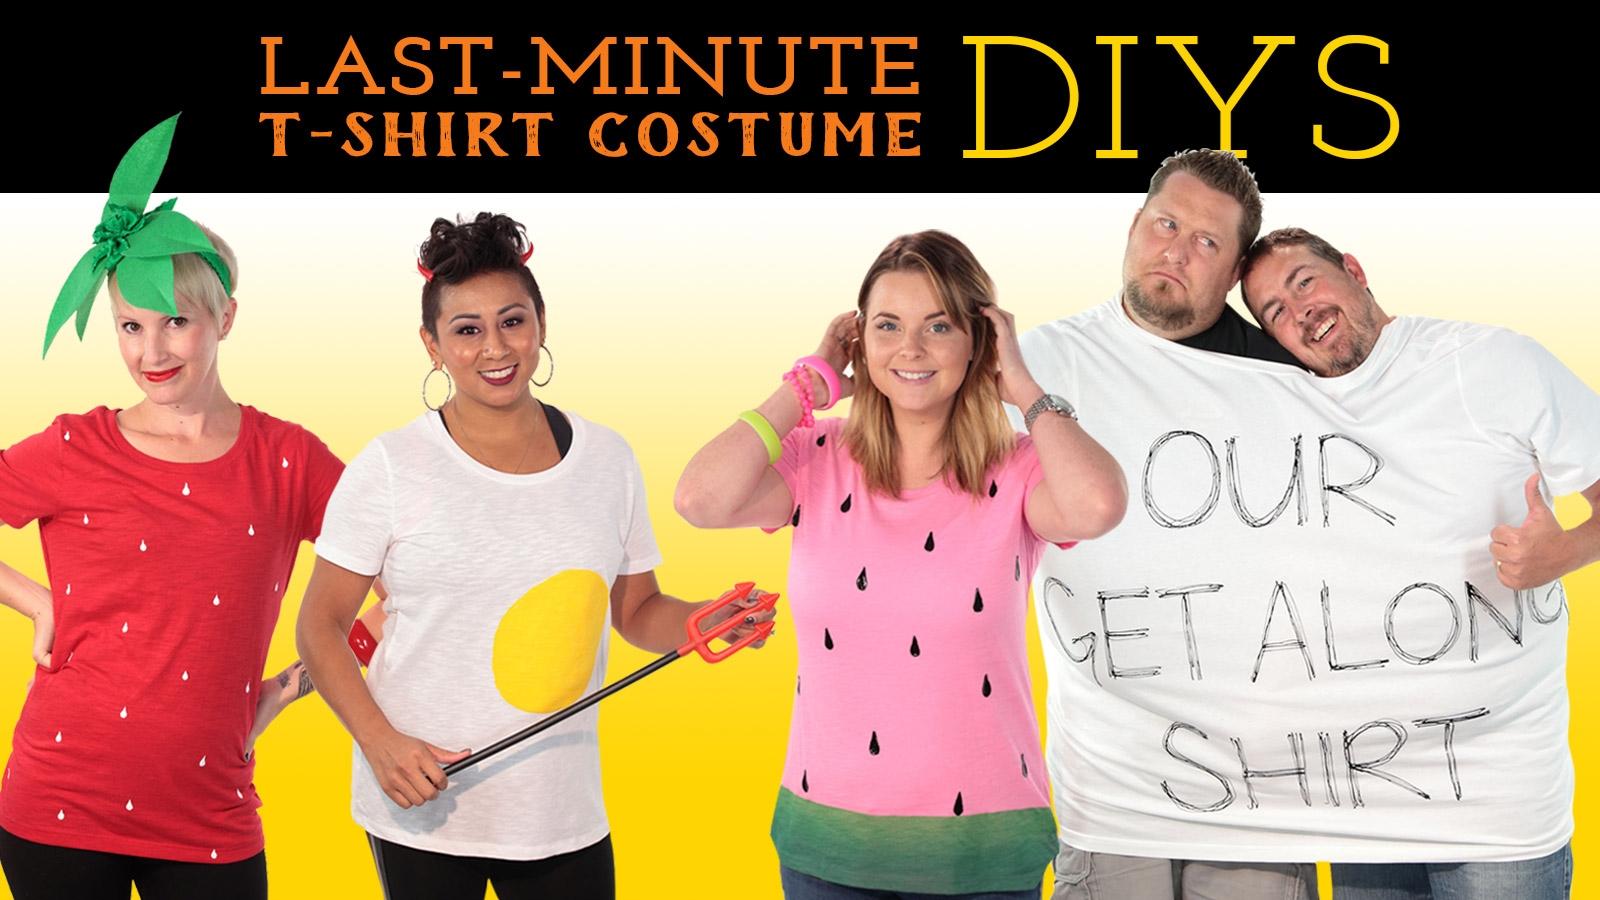 Picture of Last-Minute T-shirt Costume DIYs